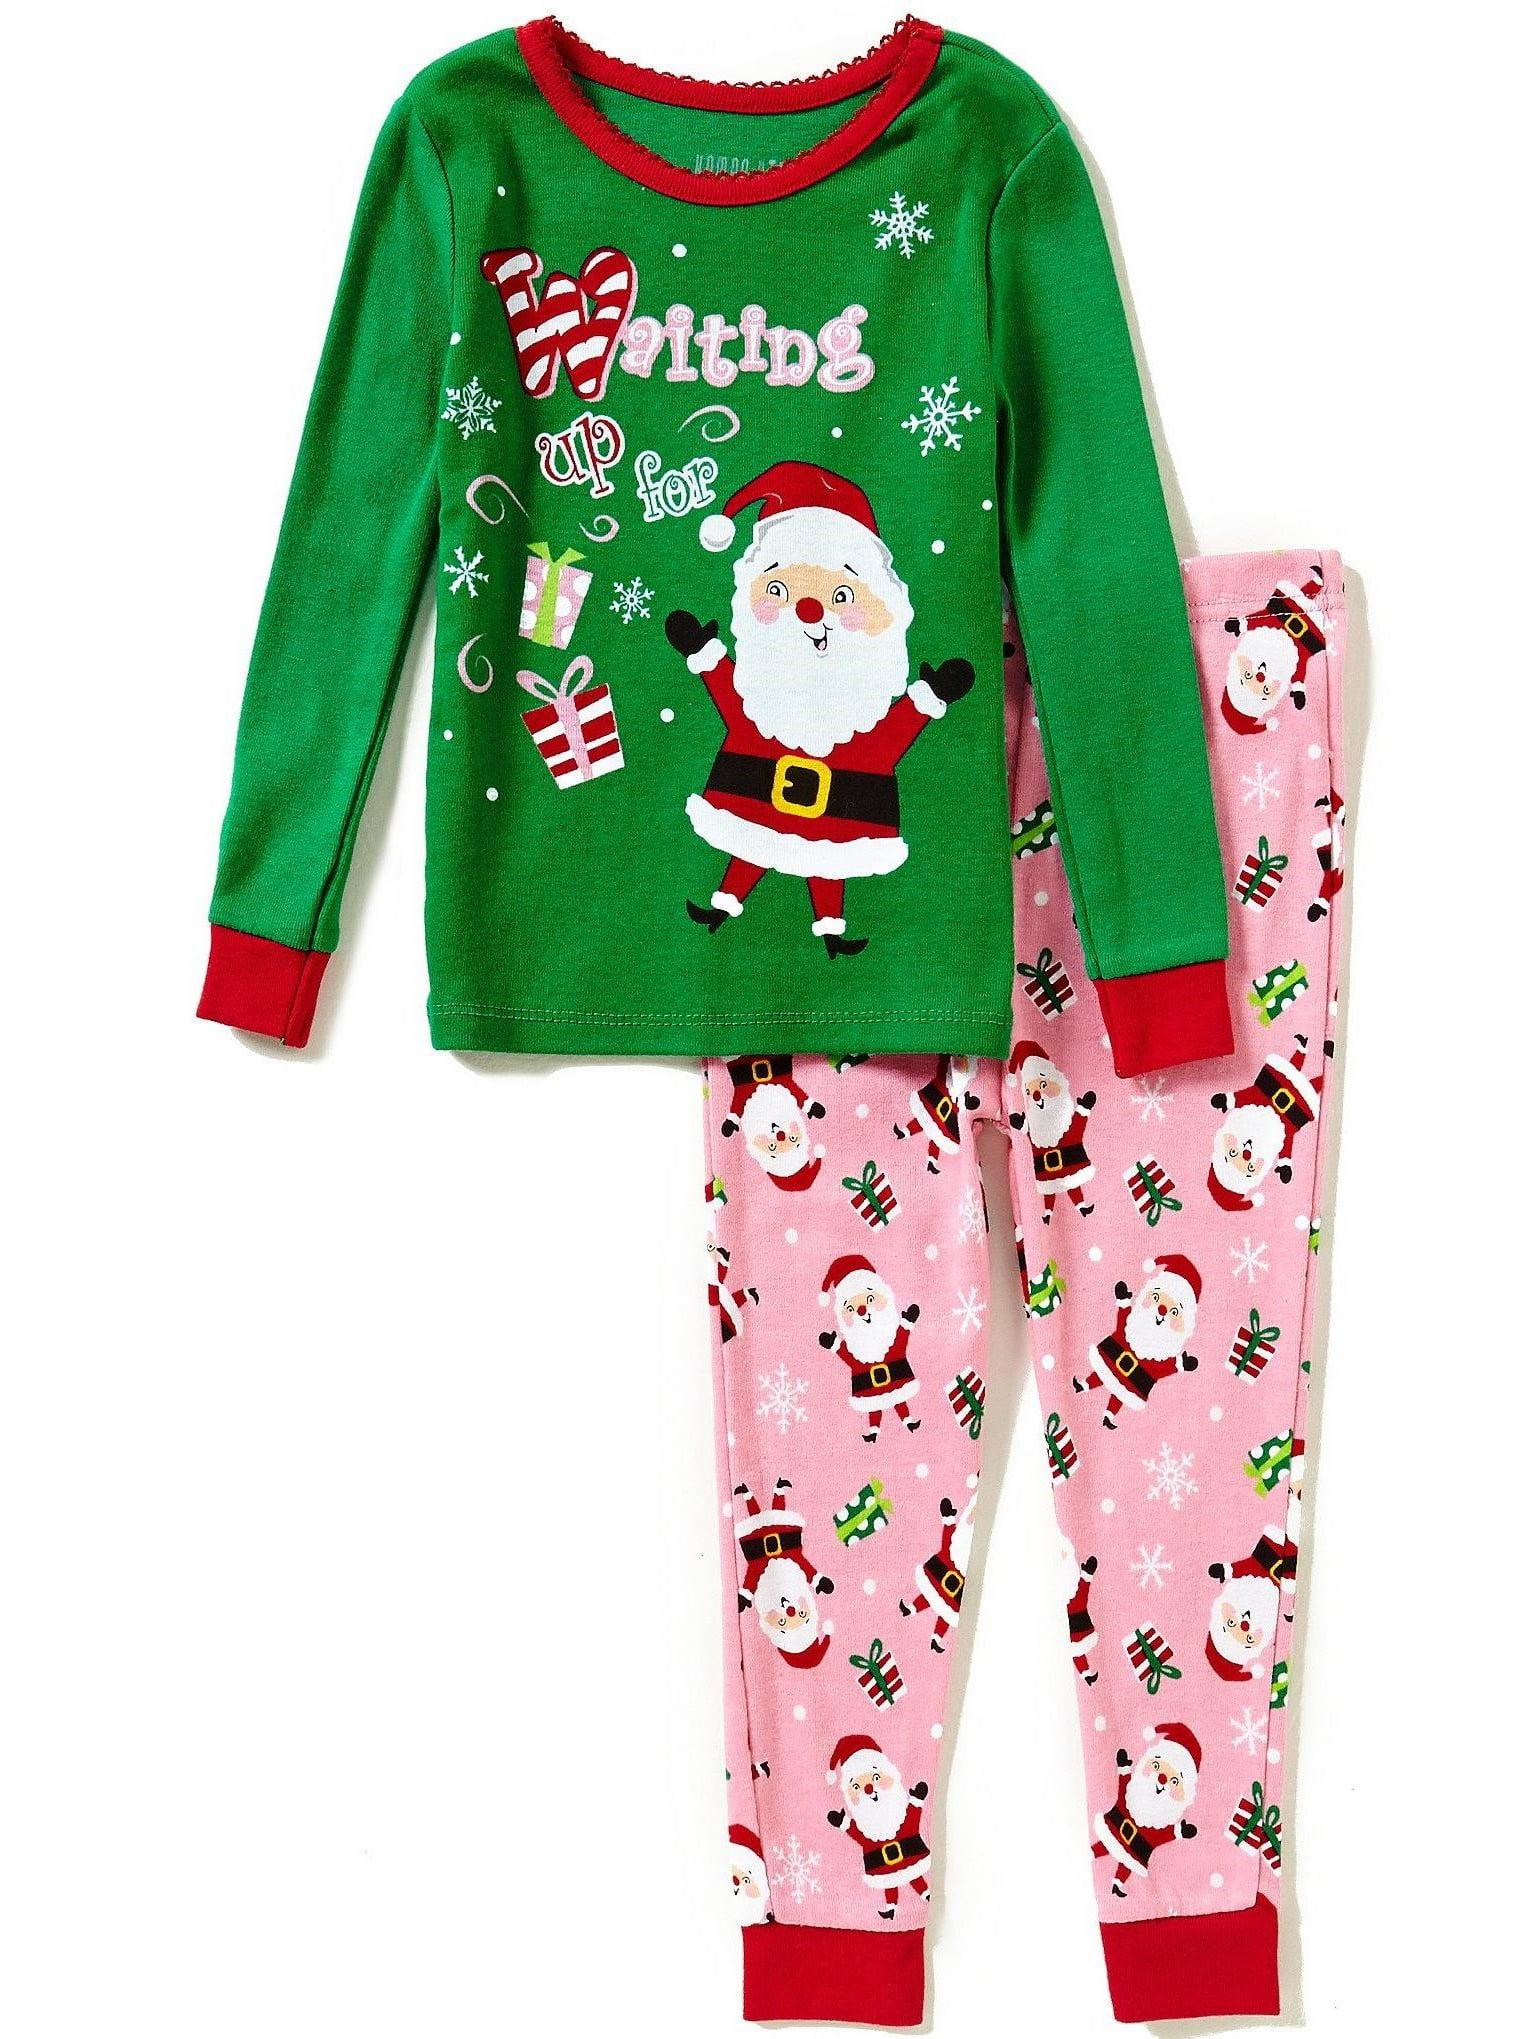 Komar Kids Happy Santa Girls Cotton Pajama Set, Toddler Sizes 2T-4T, Santa, Size: 4T